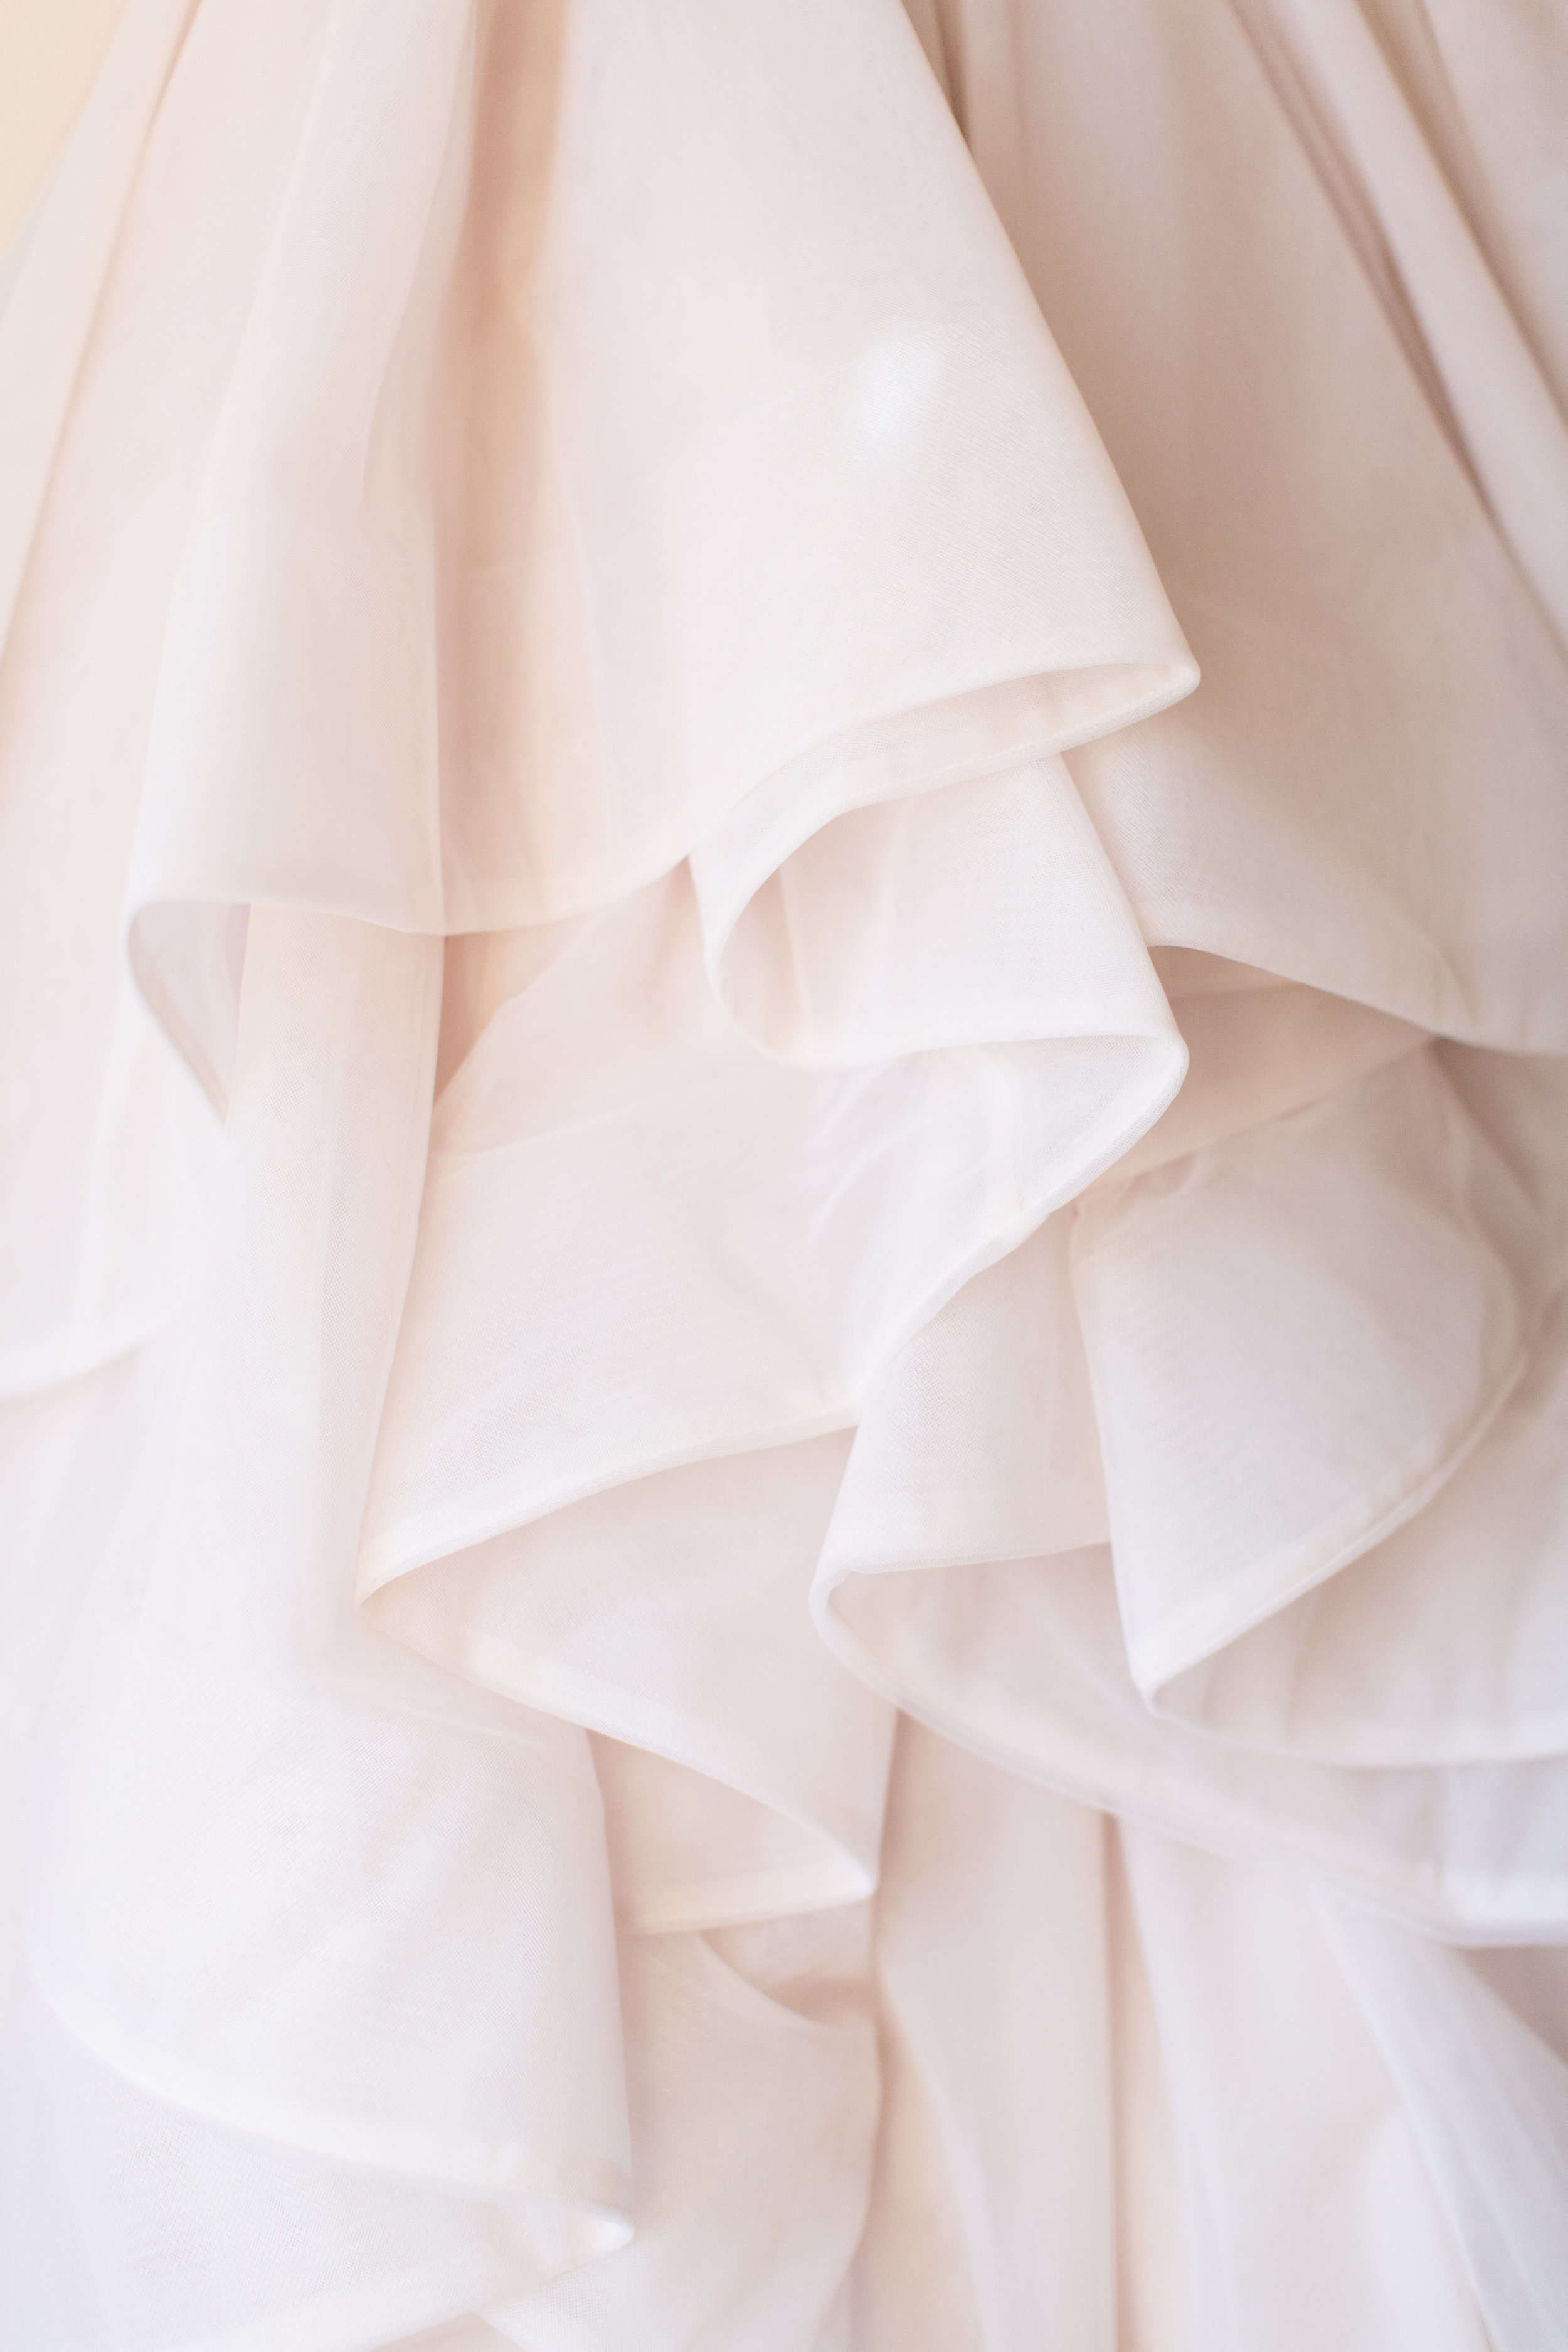 Amy_and_jordan_Baltimore_wedding_planner_wedding_dress